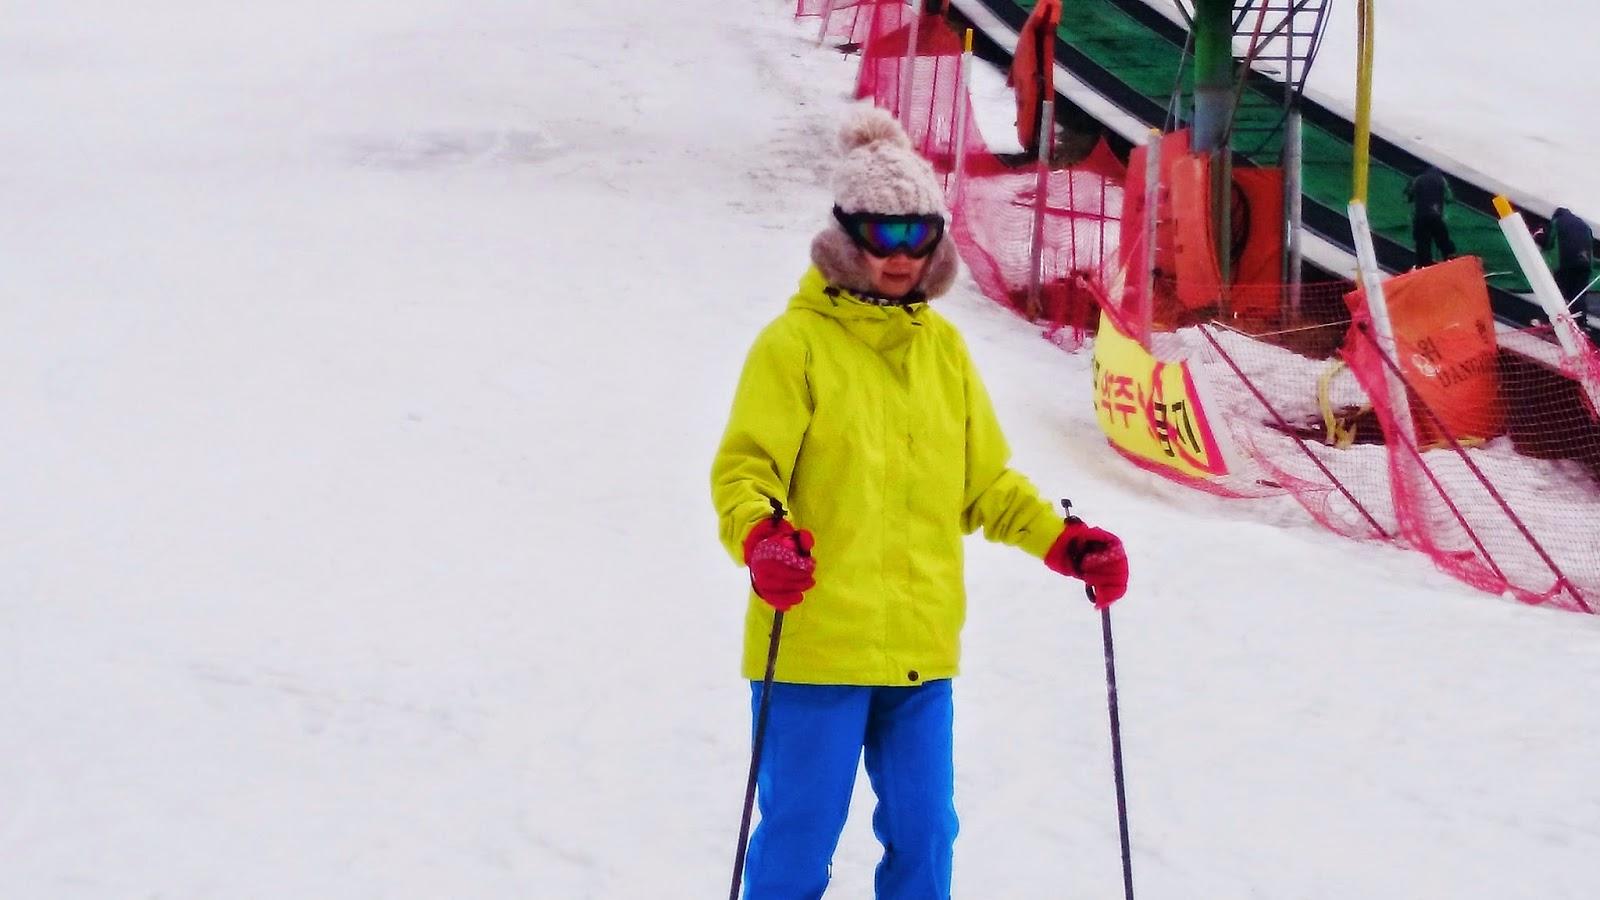 et's hit Ski Slope and Slide down the Muju Snowy Hill~!   meheartseoul.blogspot.com